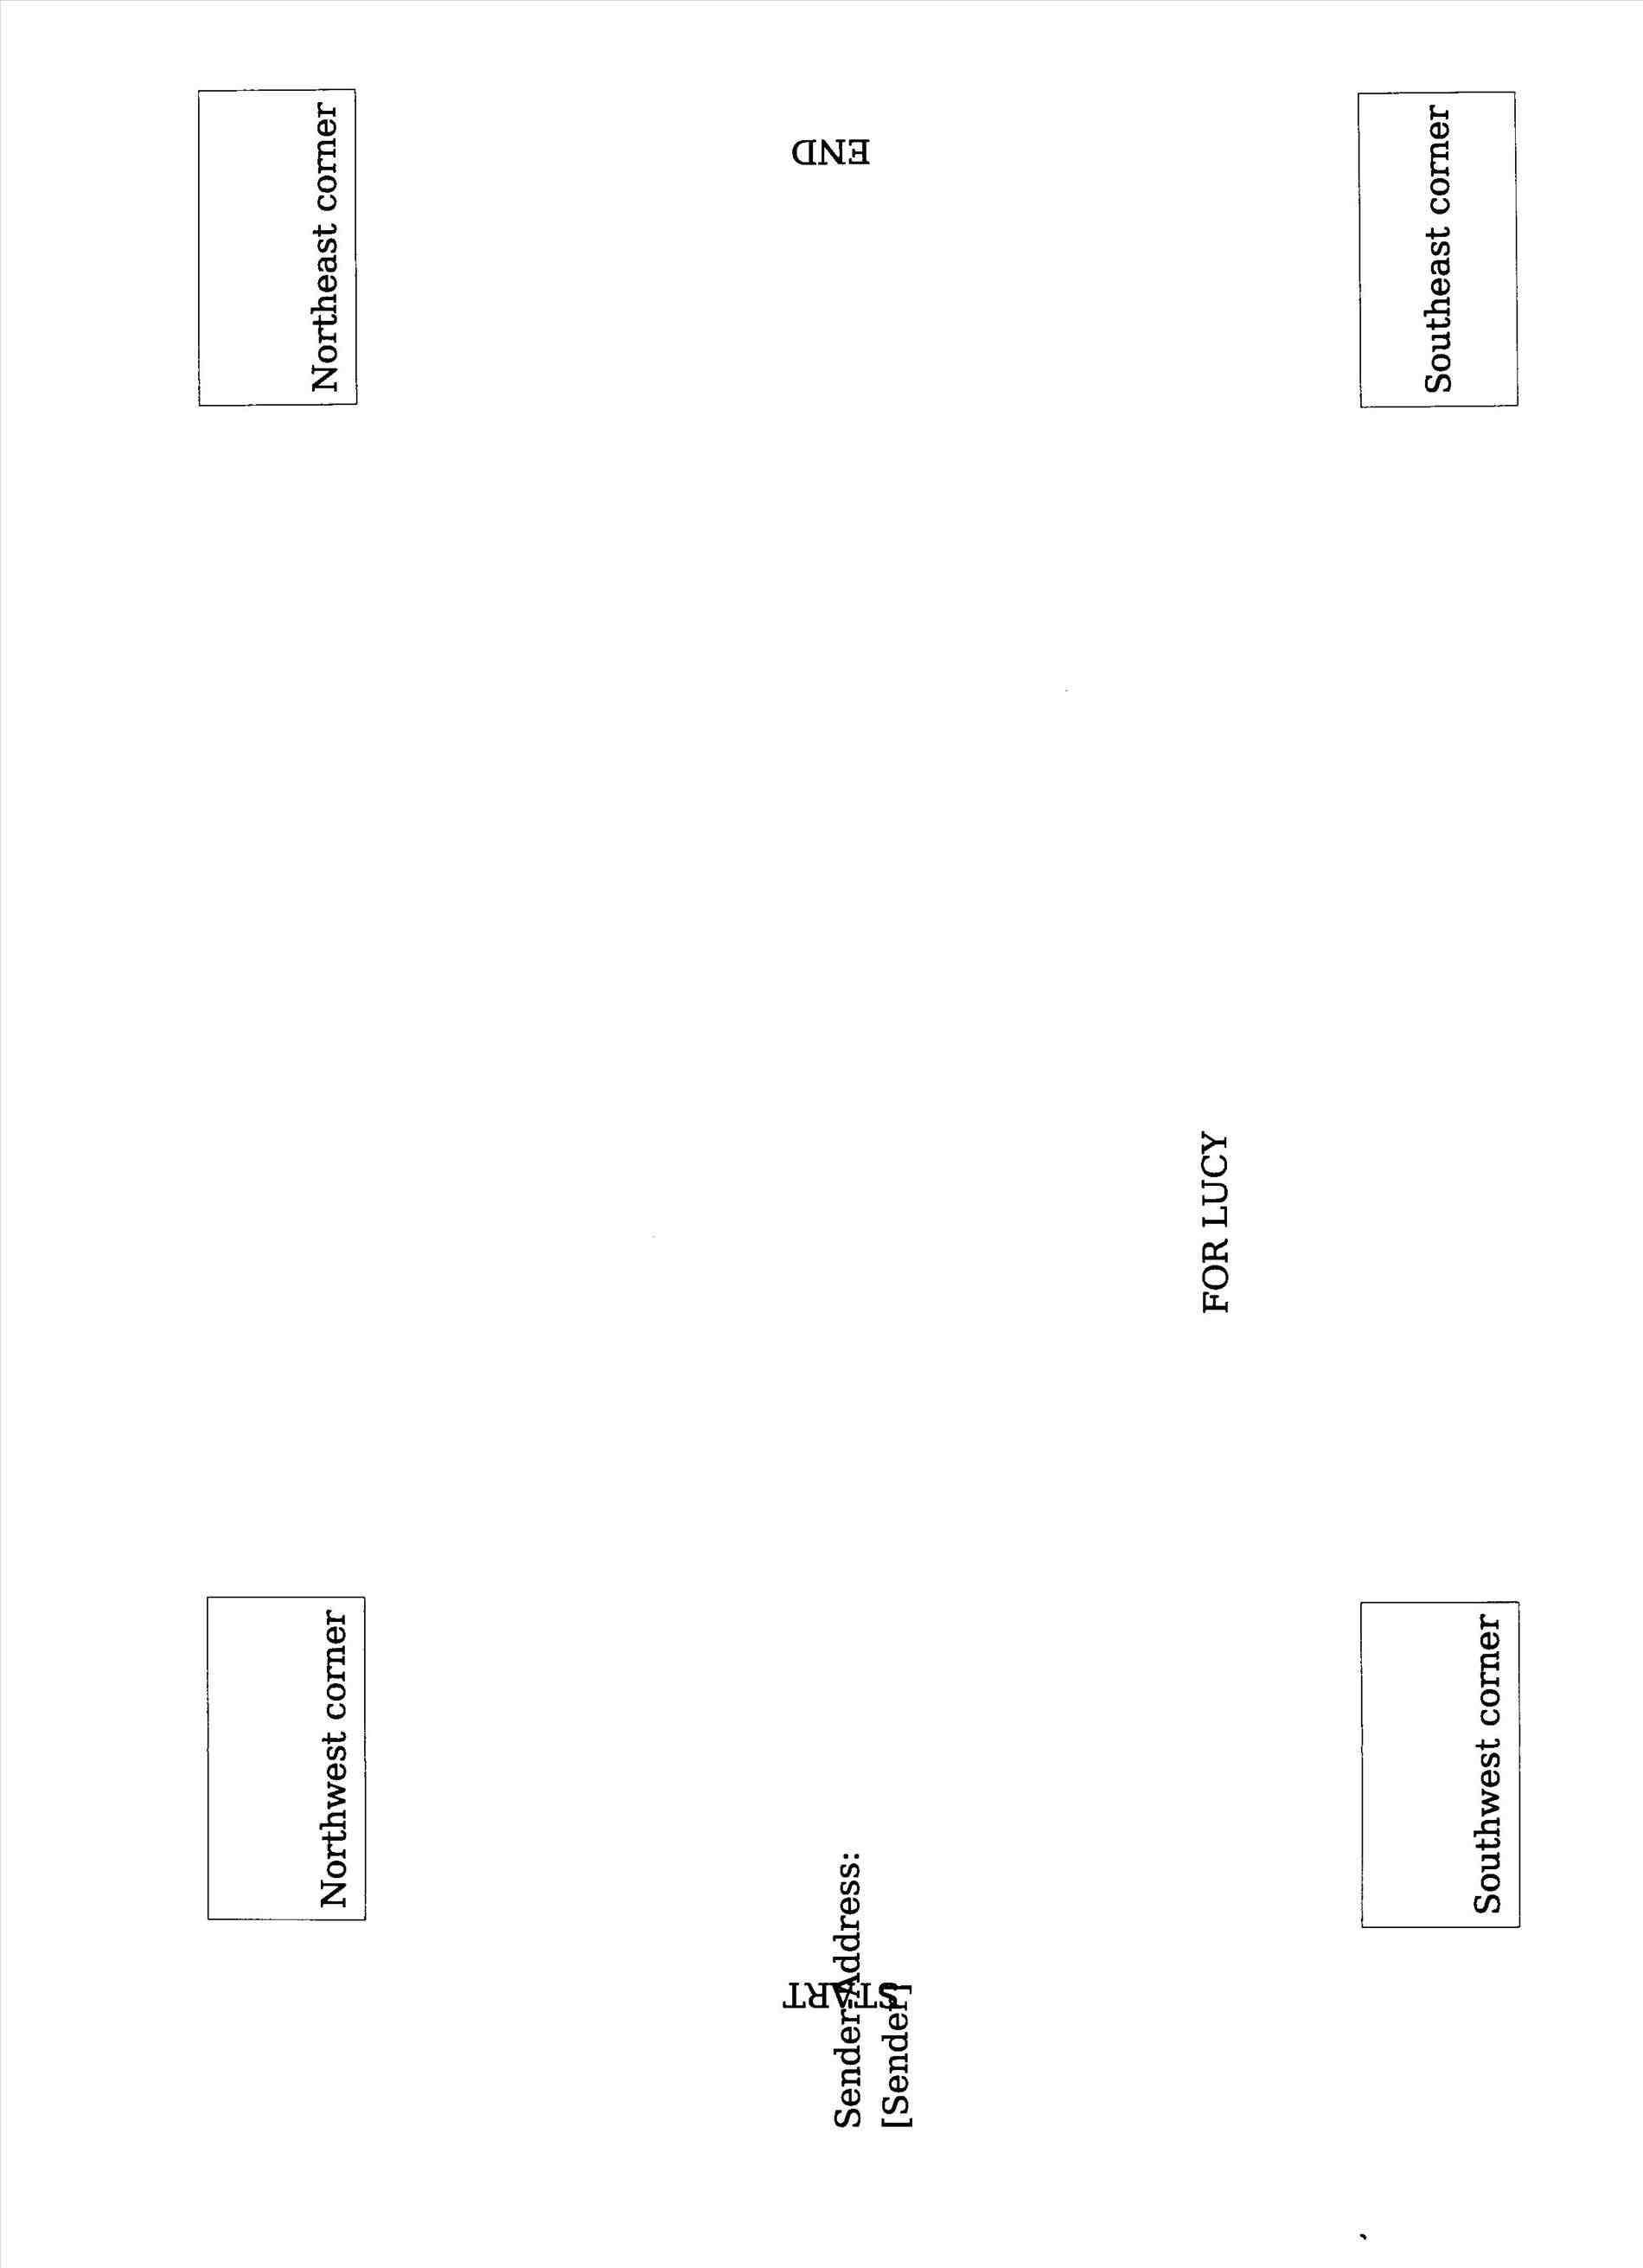 Tear-Off Flyer Template - Sample Templates - Sample Templates